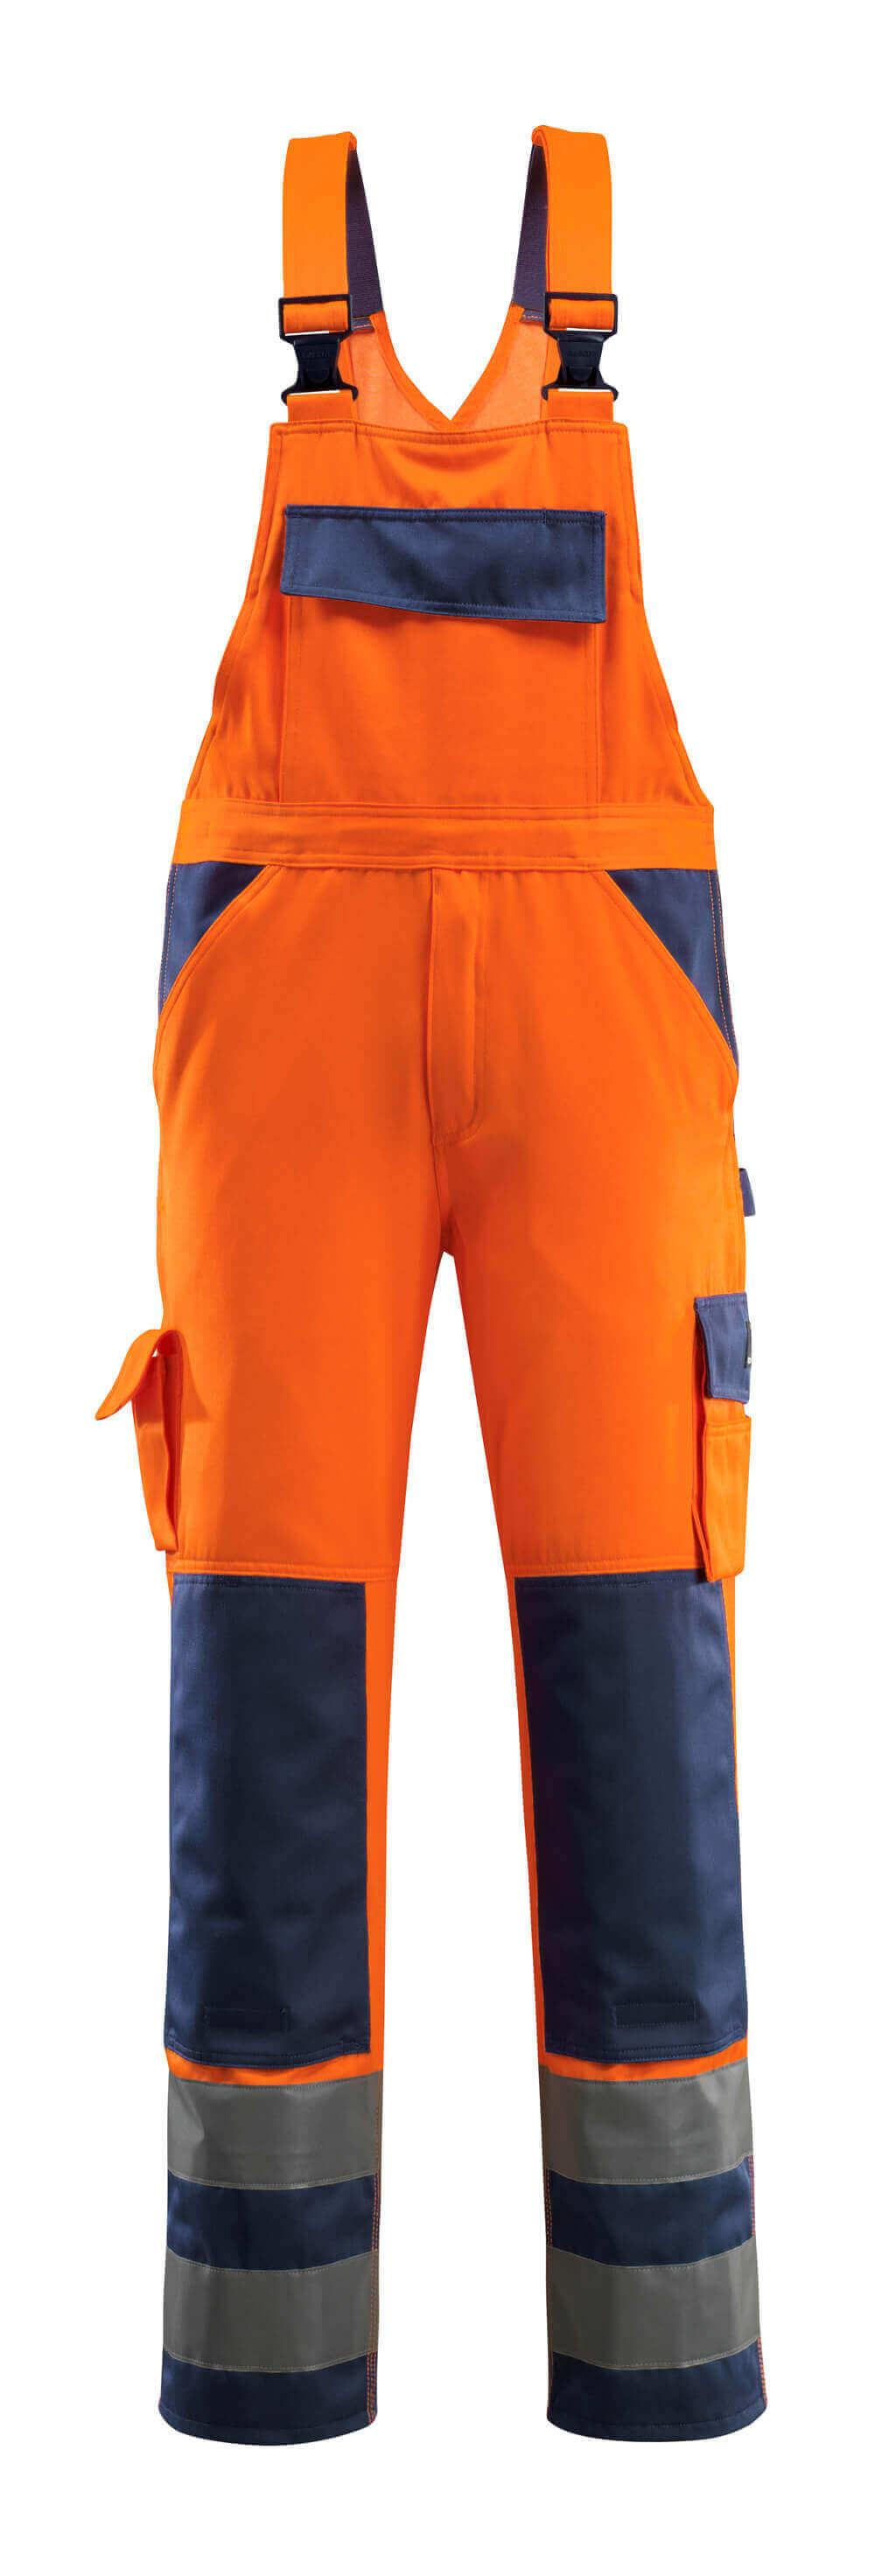 07169-860-141 Amerikaanse overall met kniezakken - hi-vis oranje/marine